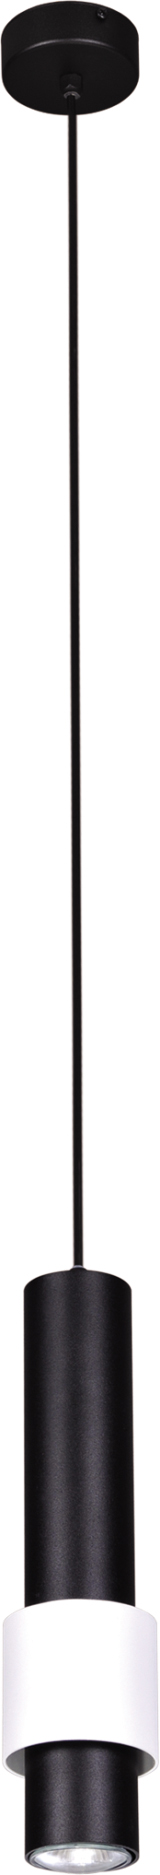 Lampa wisząca K-4547 z serii ROLL